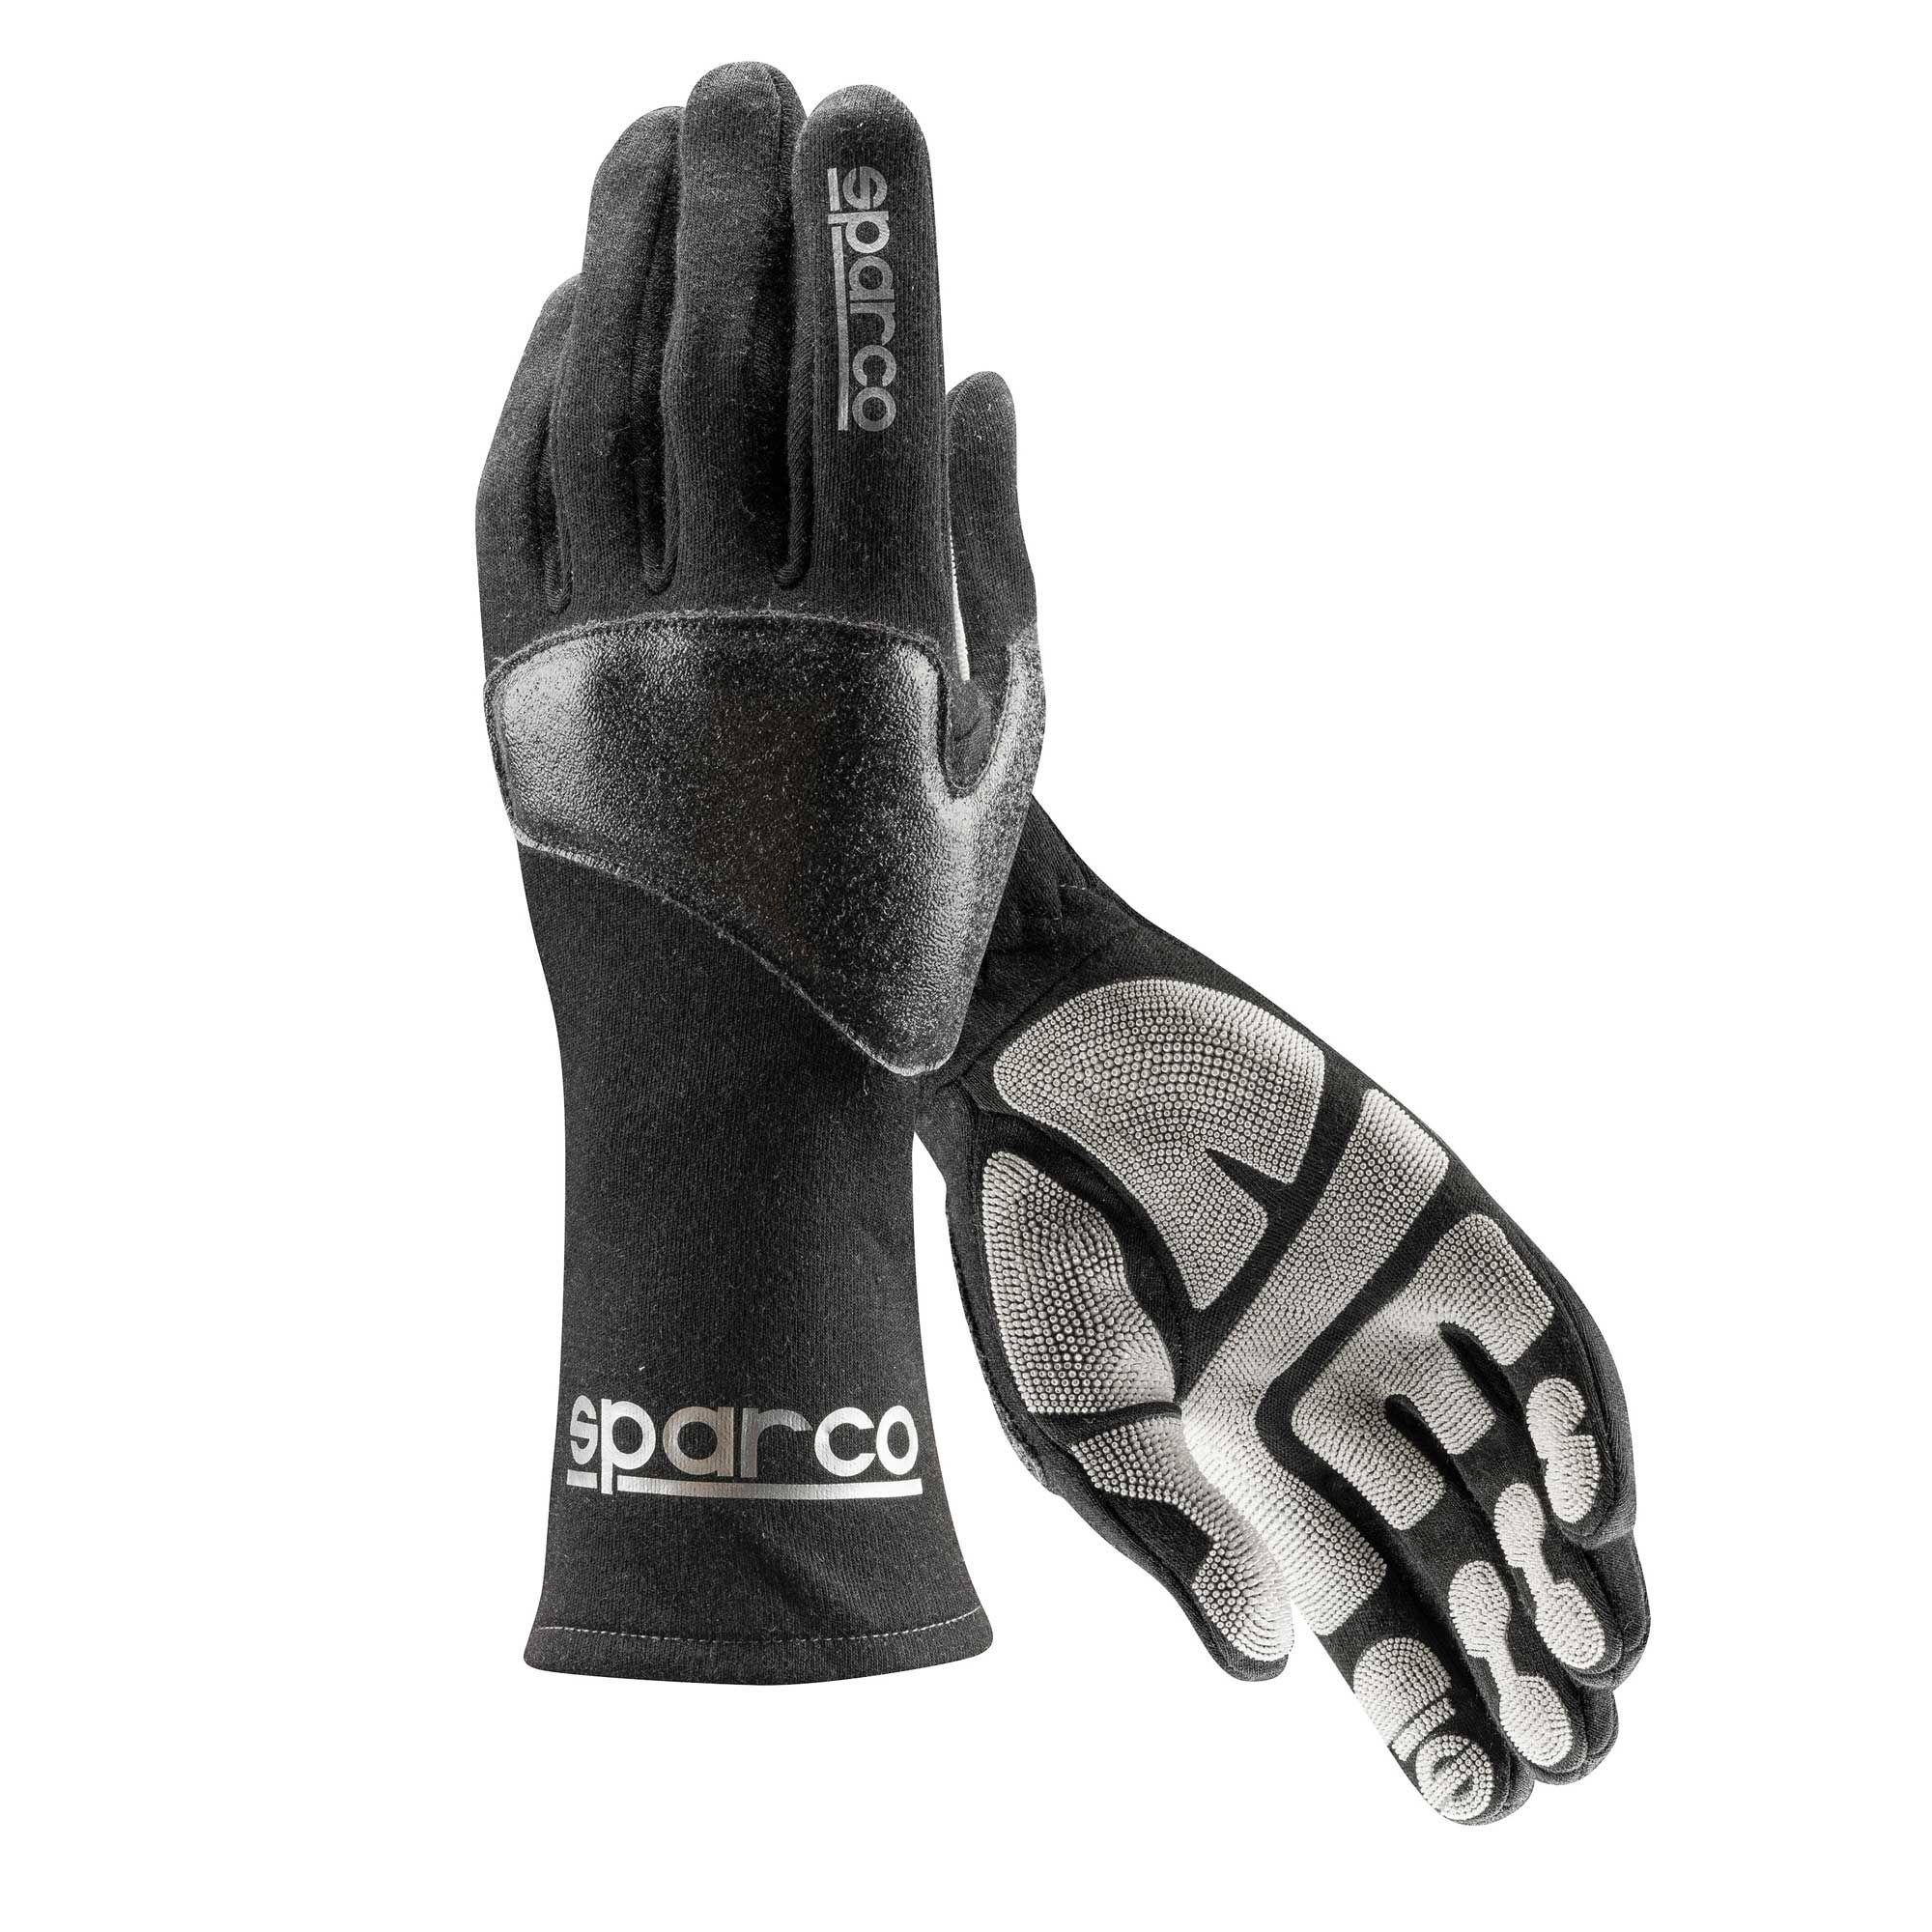 Sparco-MX-Tide-MG-9-FIA-Approved-Motorsport-Garage-Mechanics-Gloves-001303NR miniatuur 5